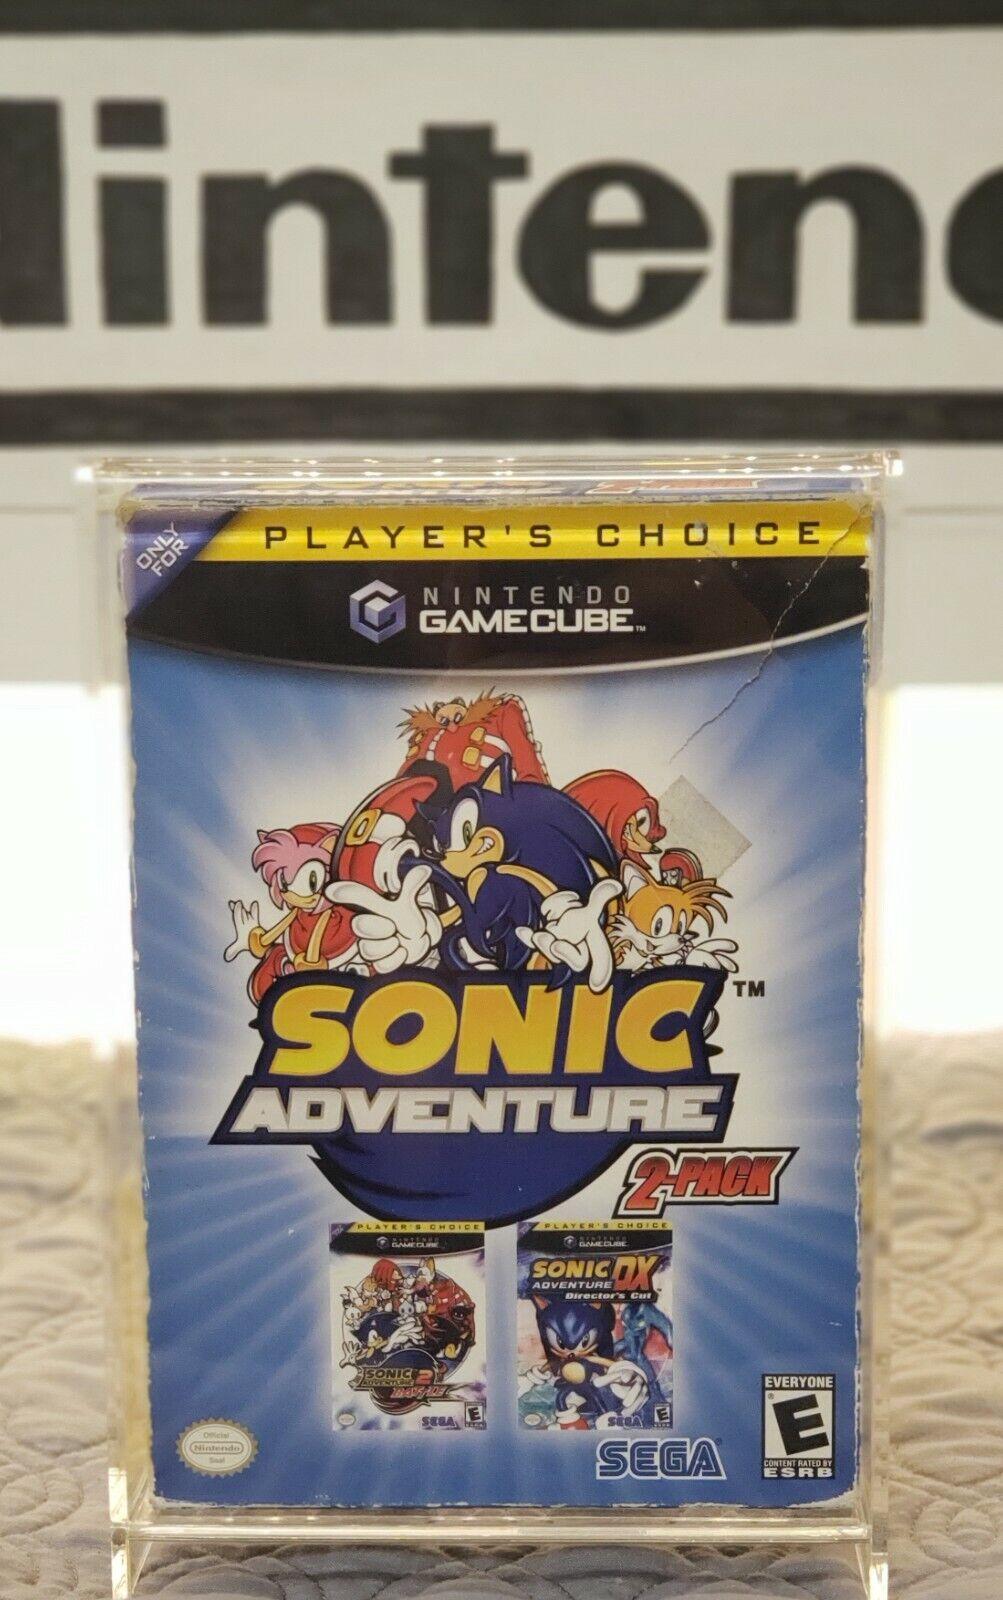 Sonic Adventure 2 Pack Nintendo Gamecube 2005 For Sale Online Ebay